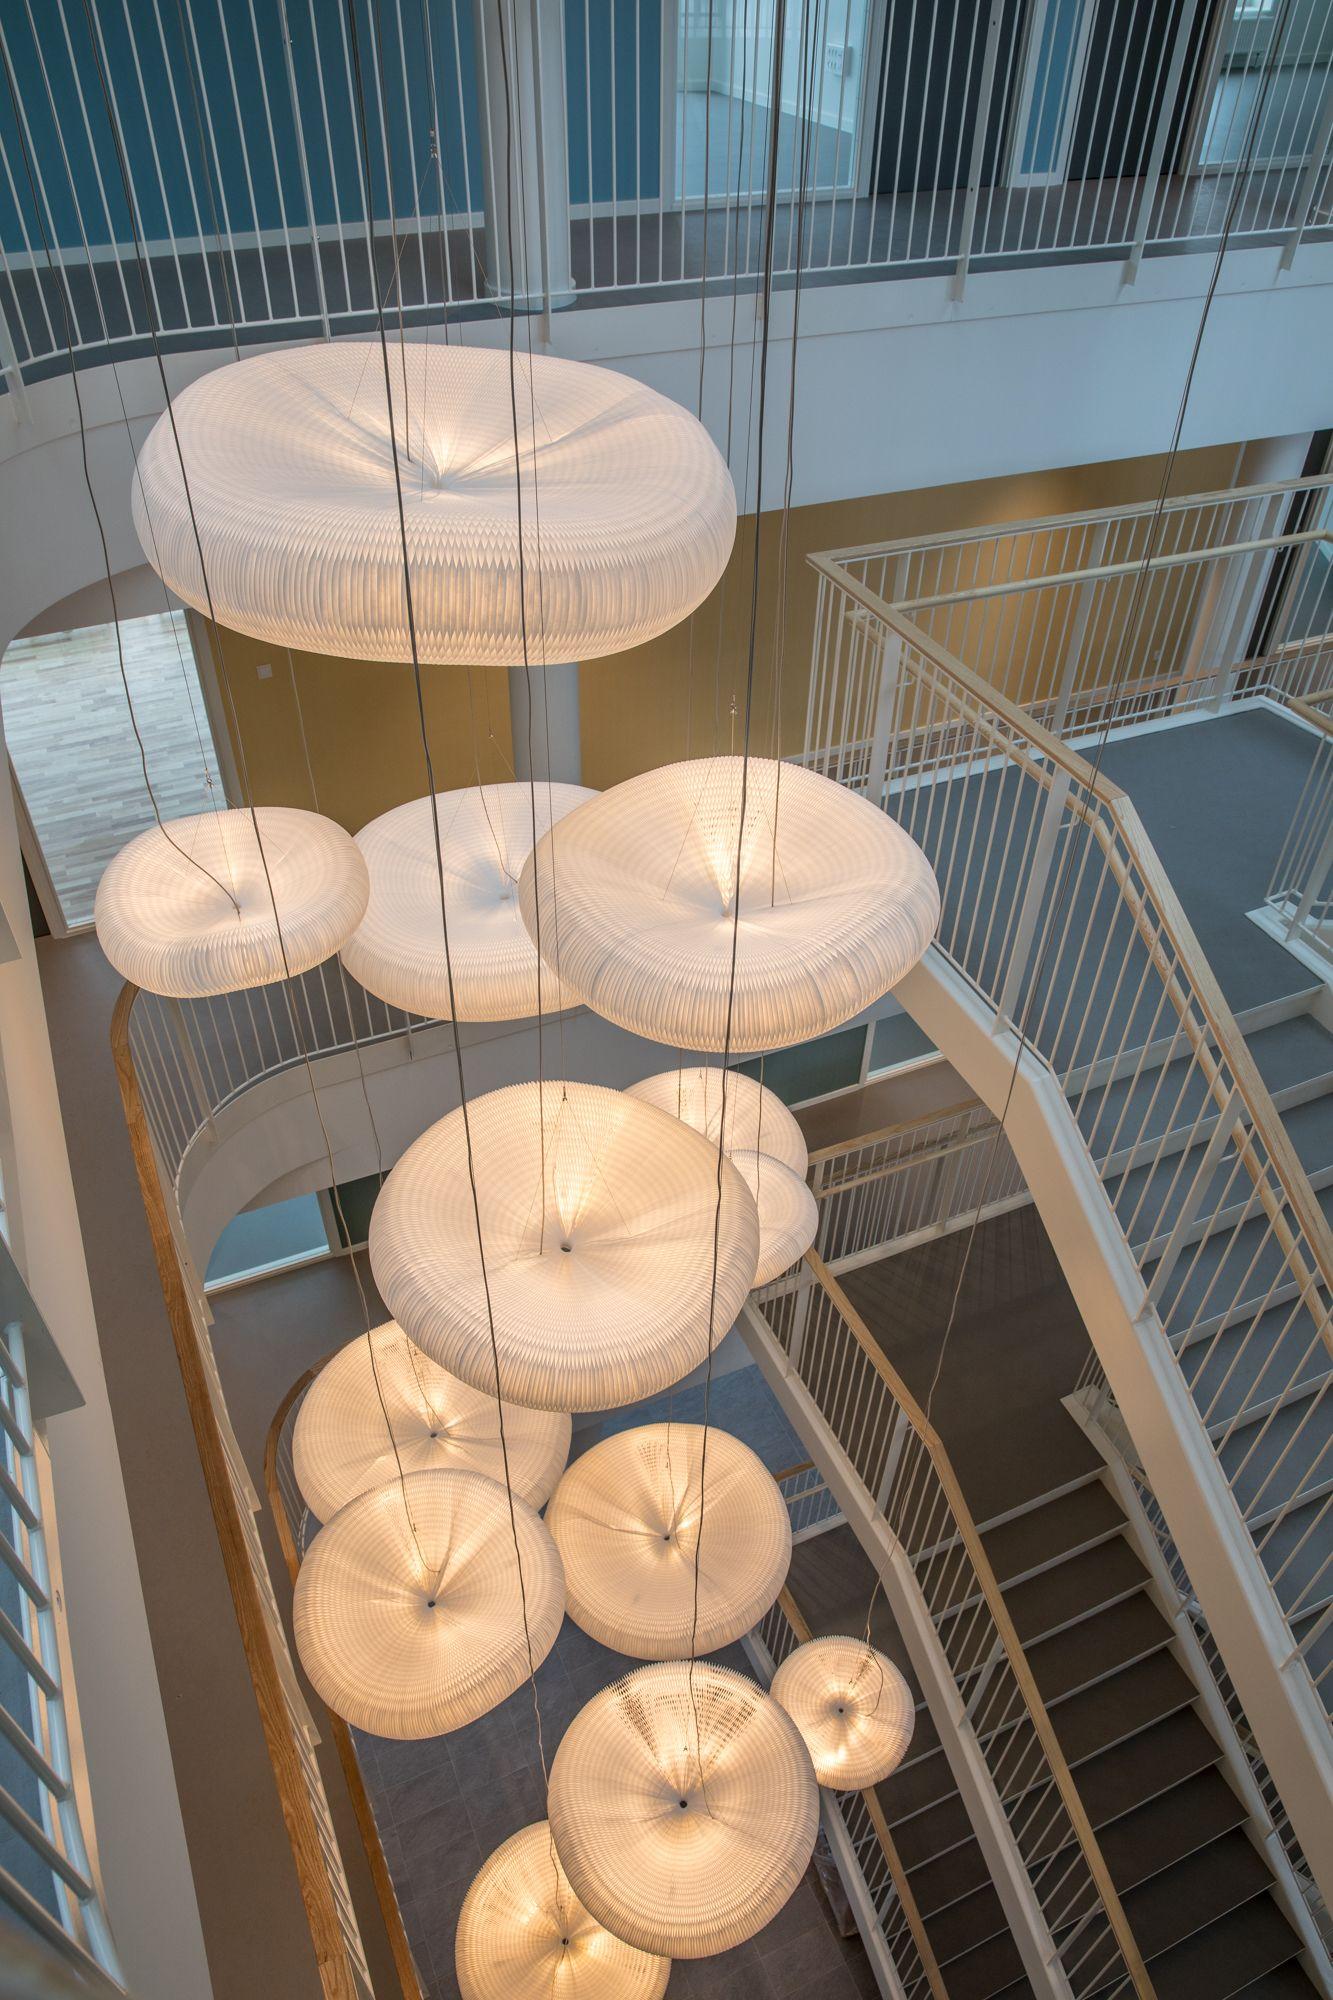 Fantastisk cloud lamps from @molostudio. Ceiling lamp, pendant, acoustic lamp DG42